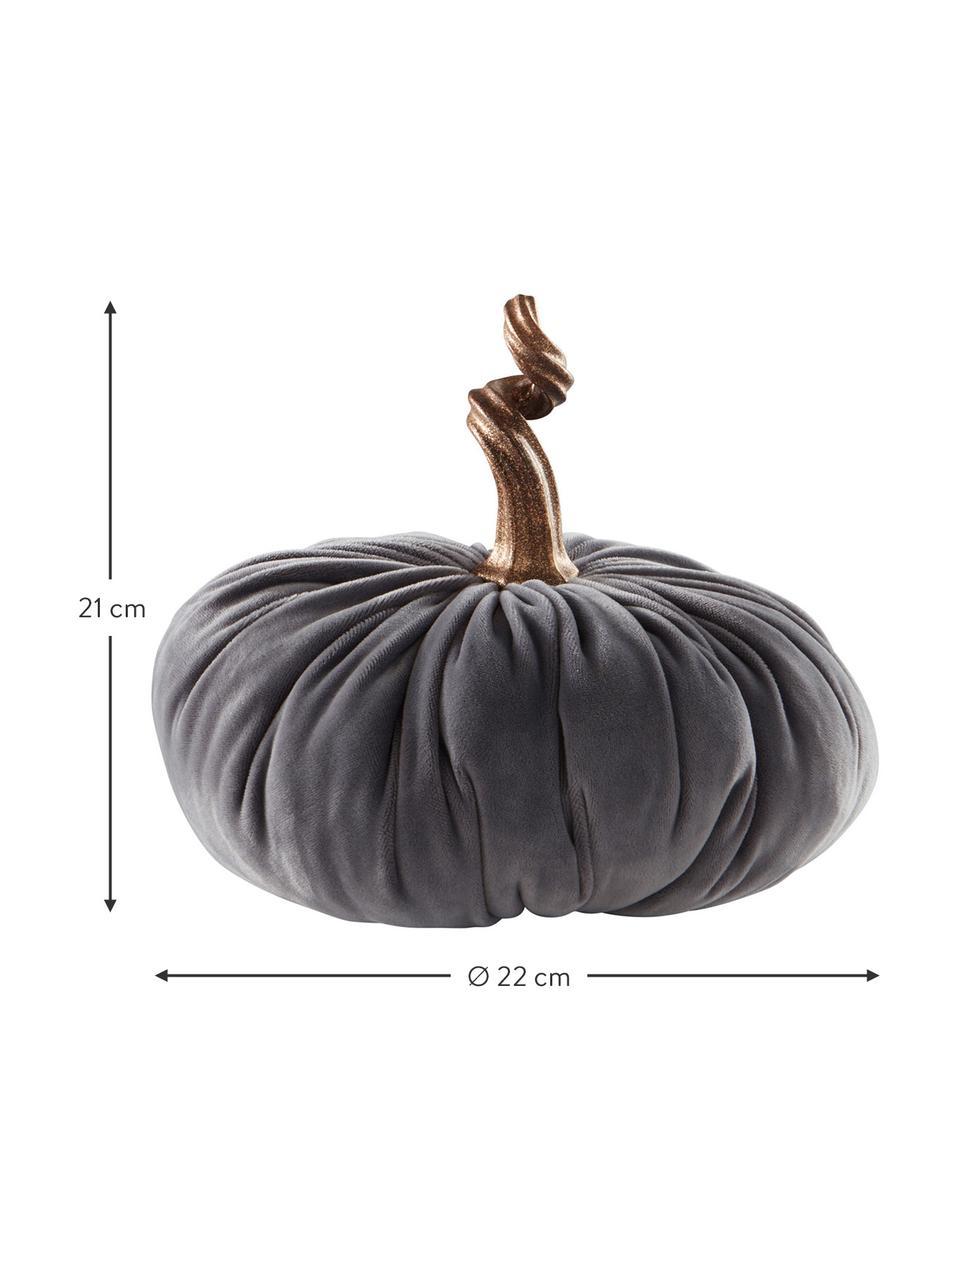 Samt-Deko-Kürbis Pumpis, 15% Polyresin, 35% Acryl, 25% Polyester, 25% Quartzsandfüllung, Grau, Ø 22 x H 21 cm